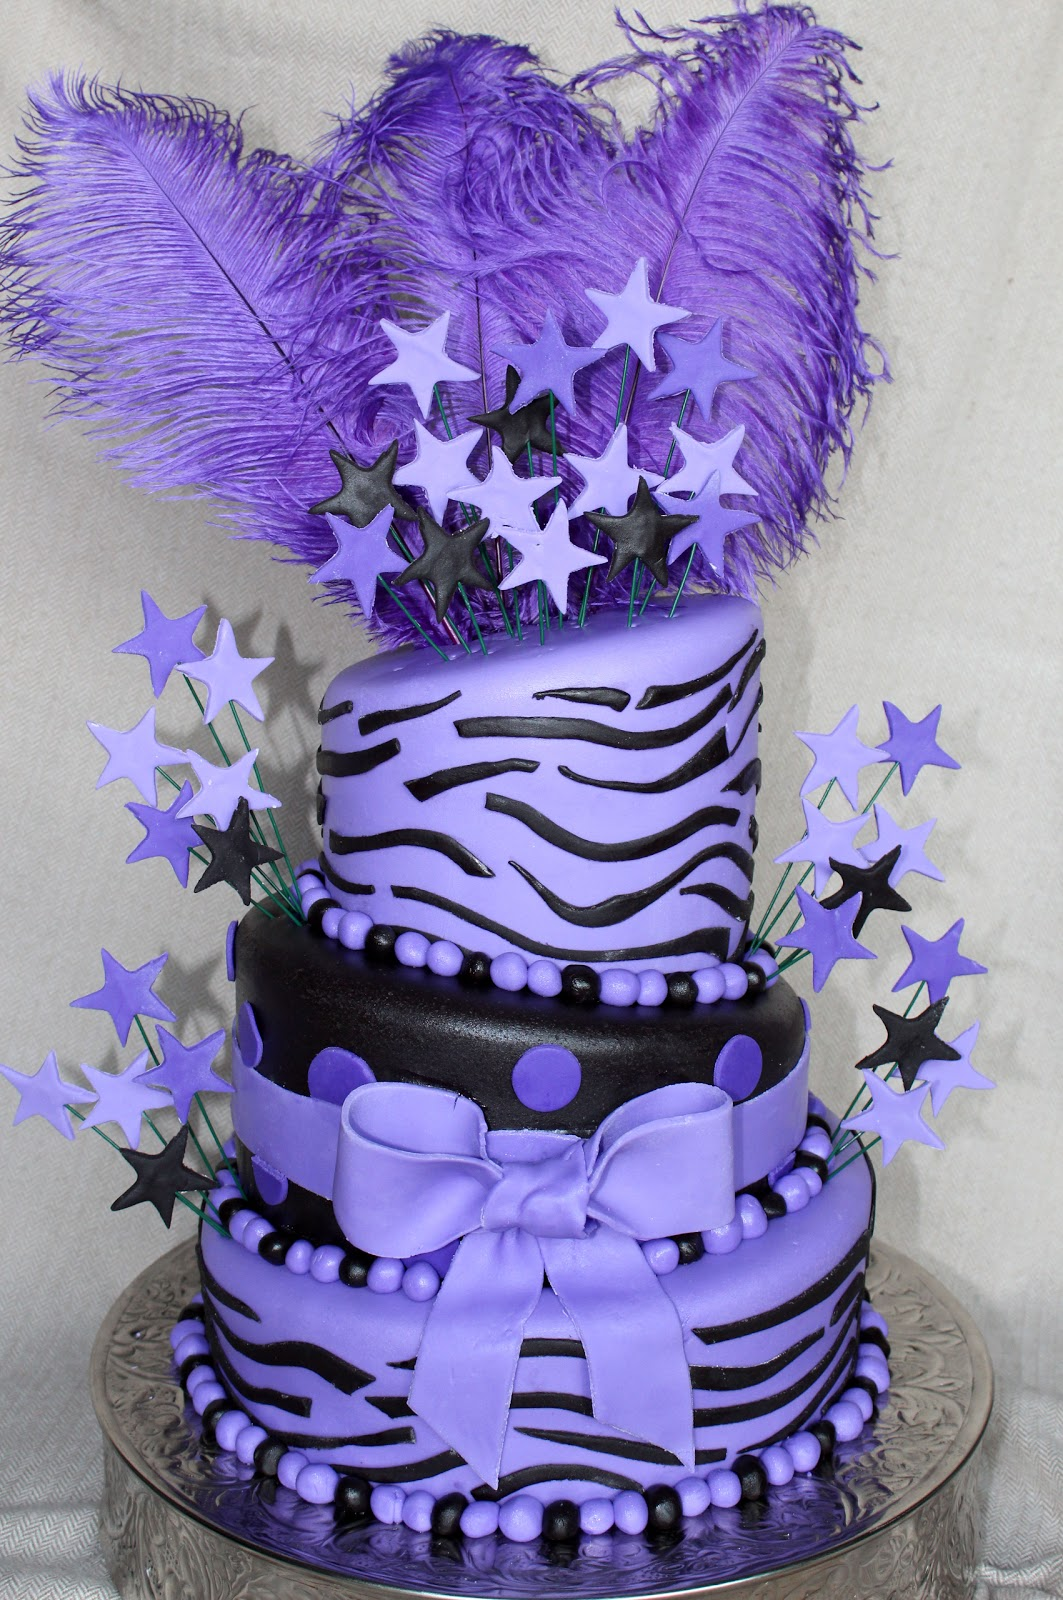 Cake Flair Purple Zebra And Feathers Cake